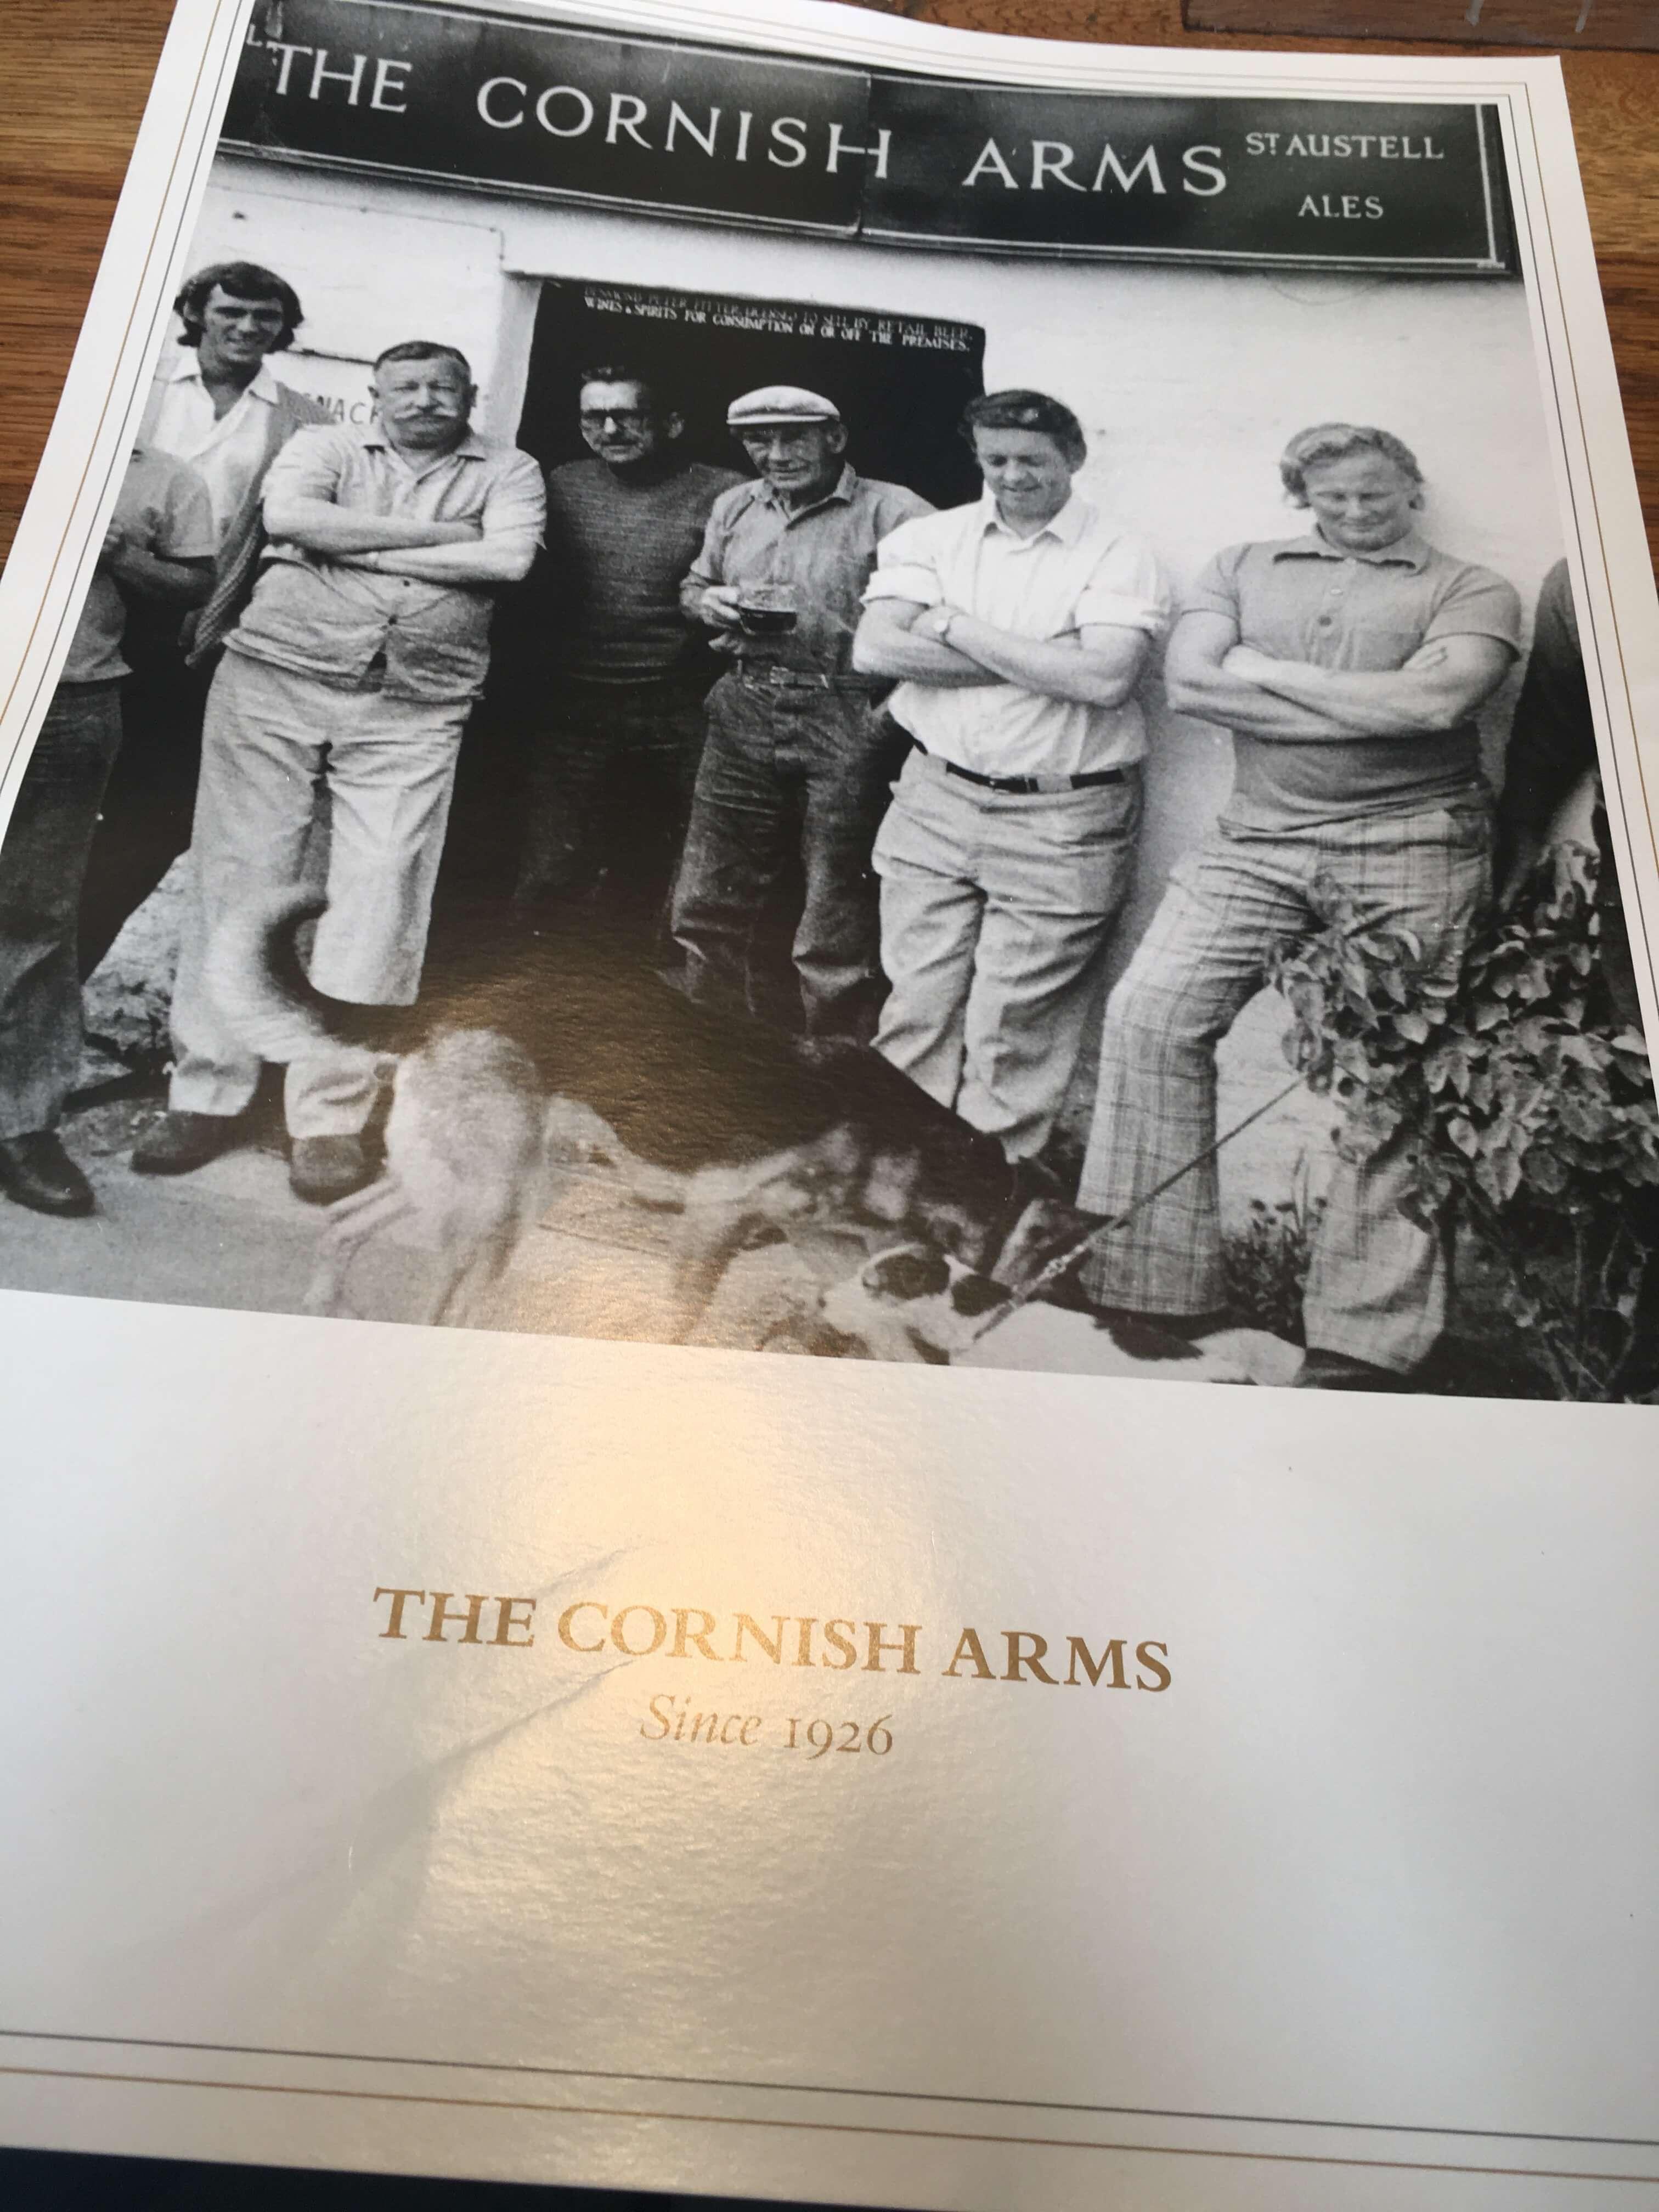 The Cornish Arms menu